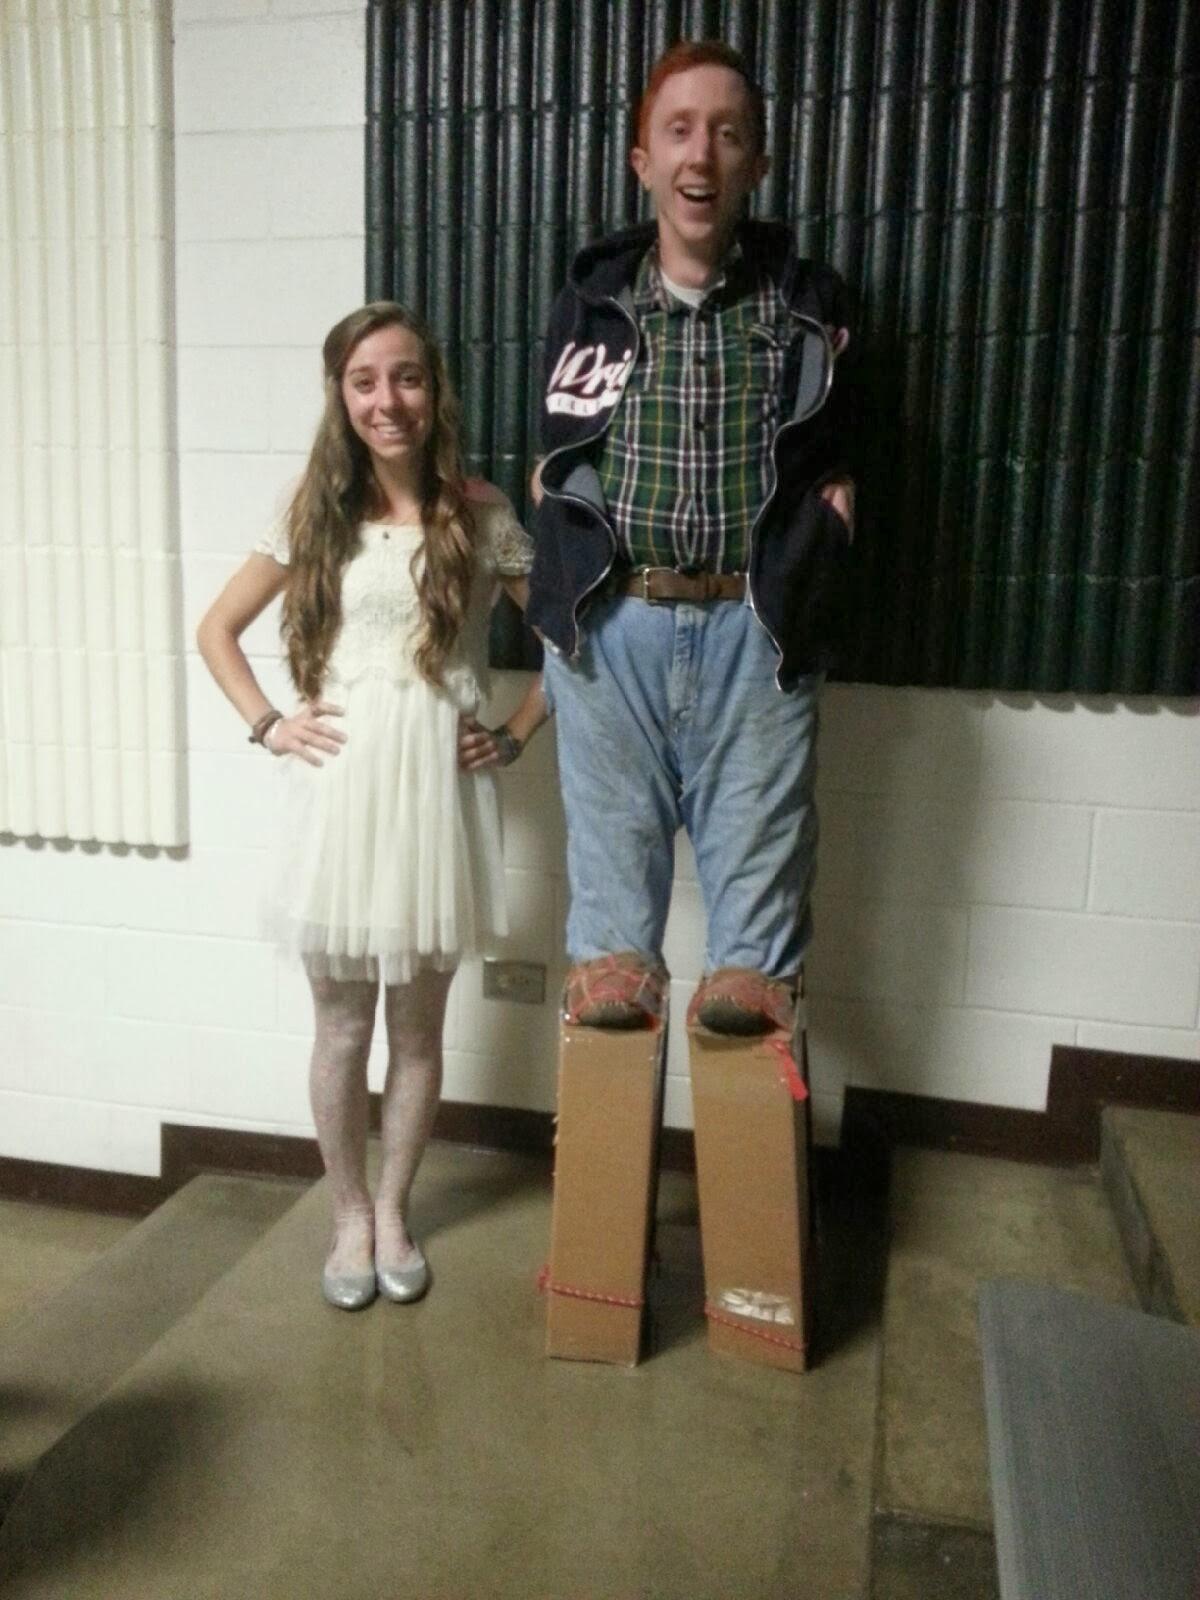 Midget on stilts, donating sperm in canada